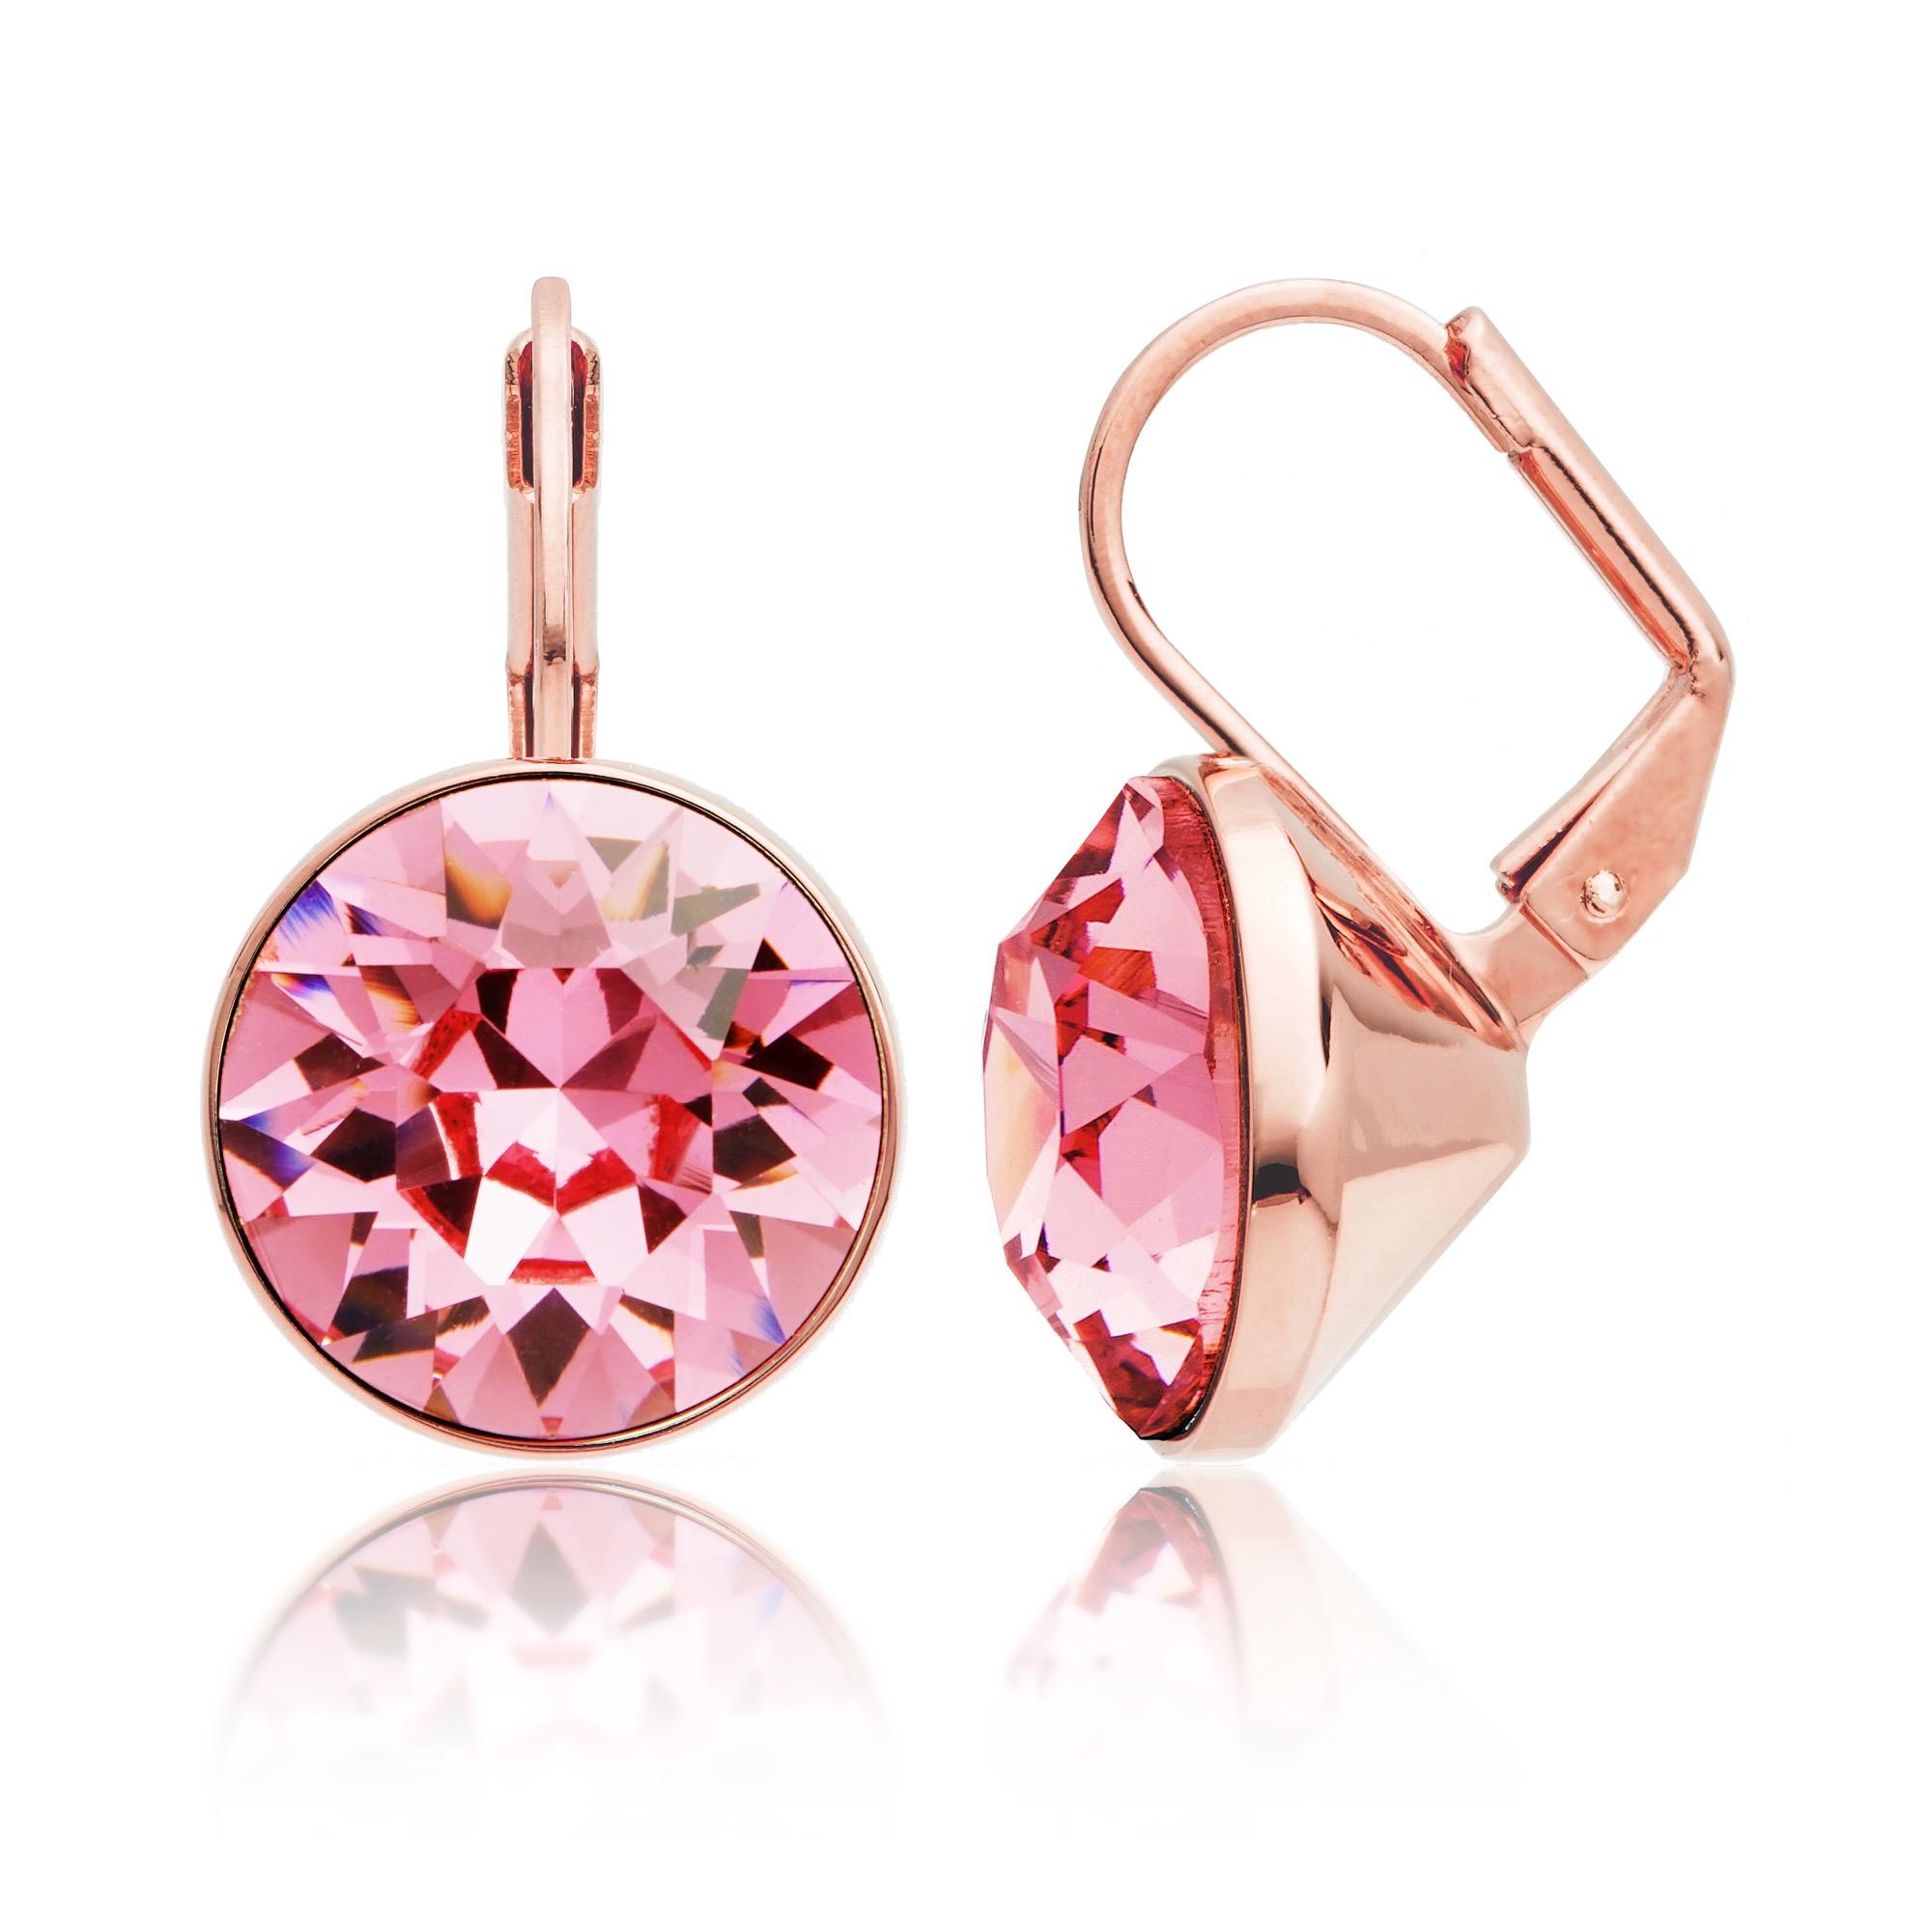 47f372aaa Bella Earrings with 8.5 Carat Light Rose Swarovski® Crystals Rose ...